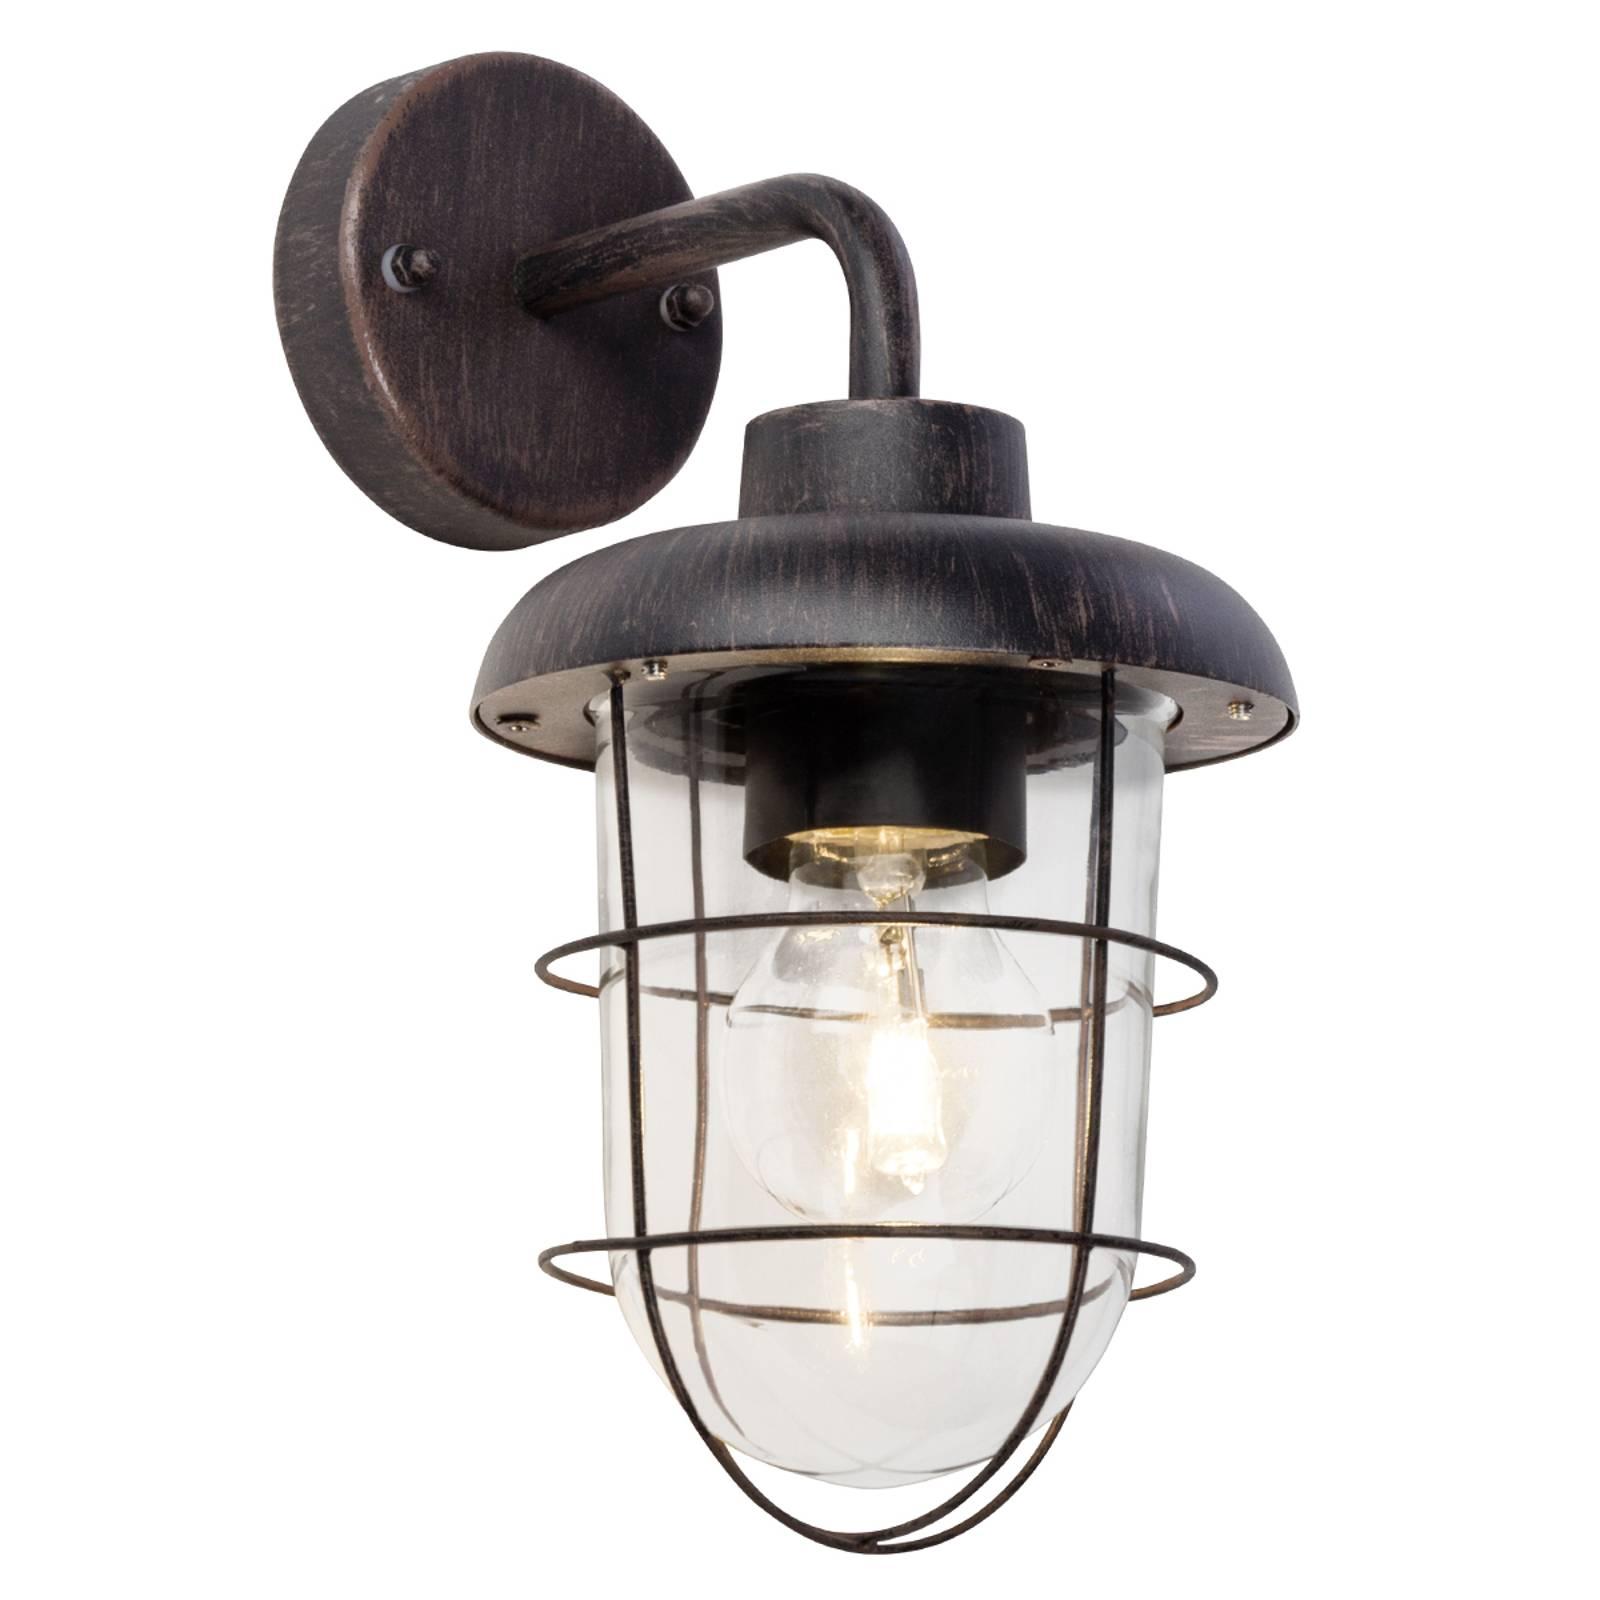 Carlisle - zwarte buitenwandlamp met frame